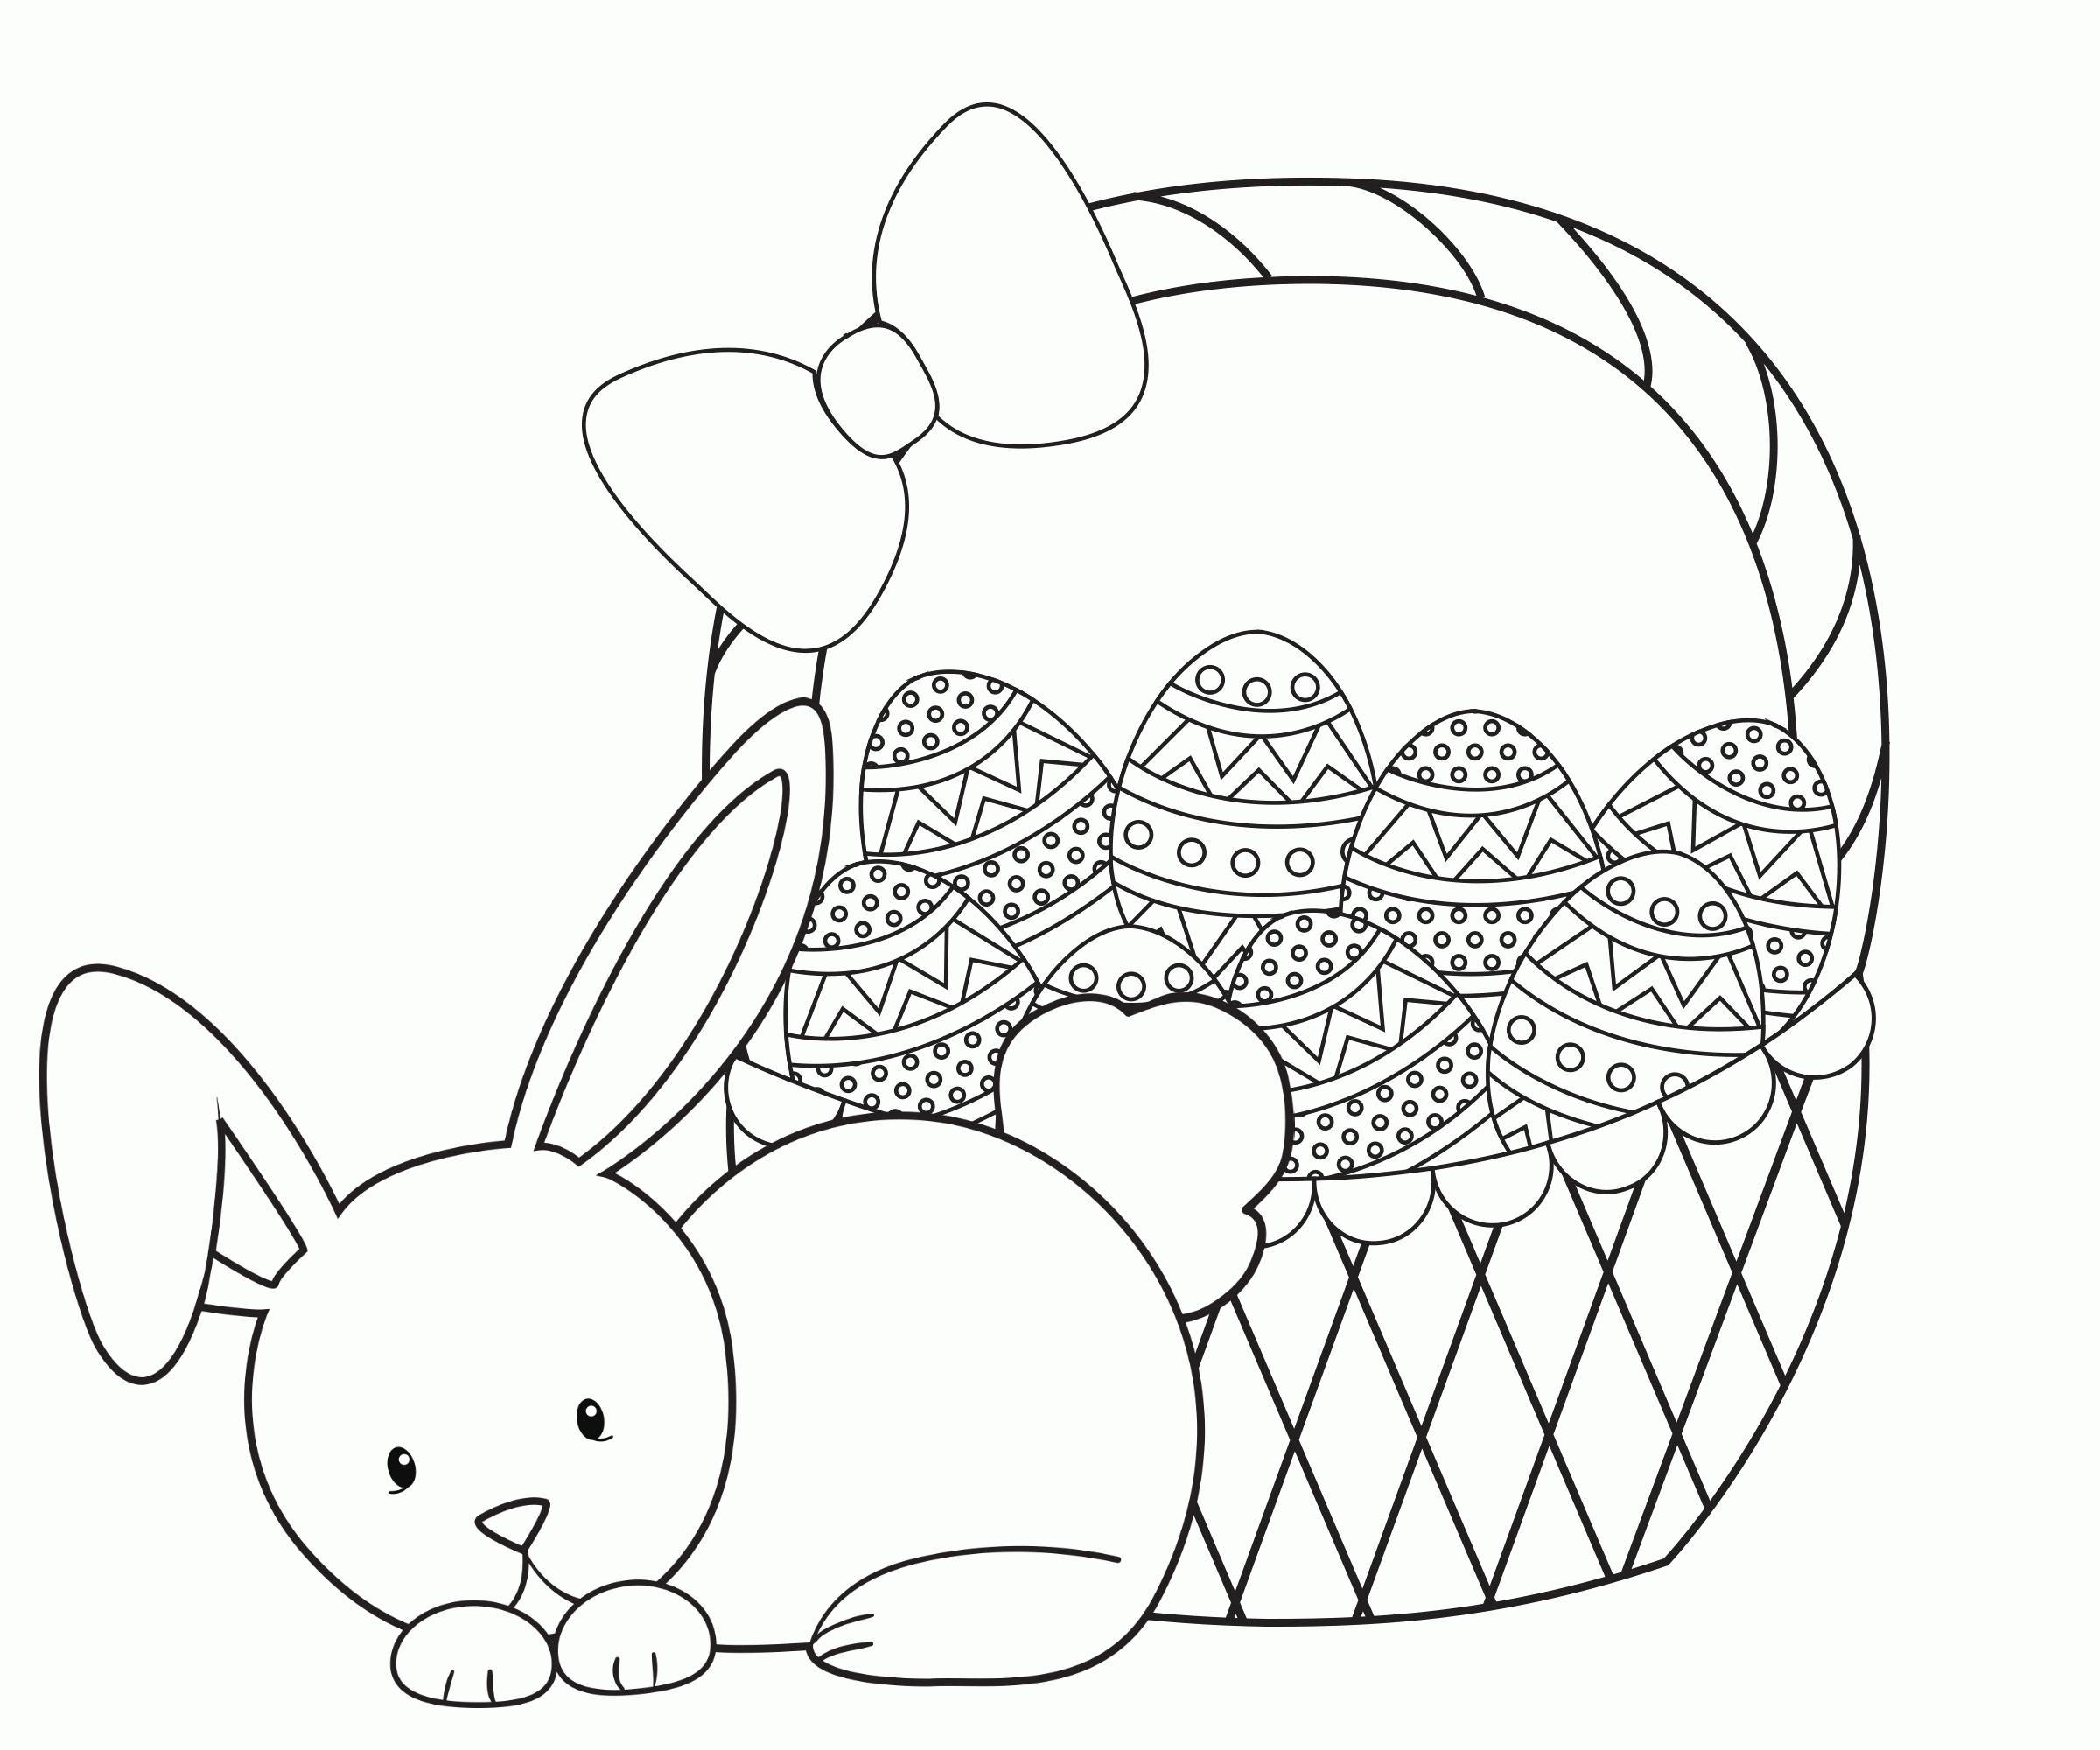 Easter Basket Printable Coloring Pages At Getdrawings